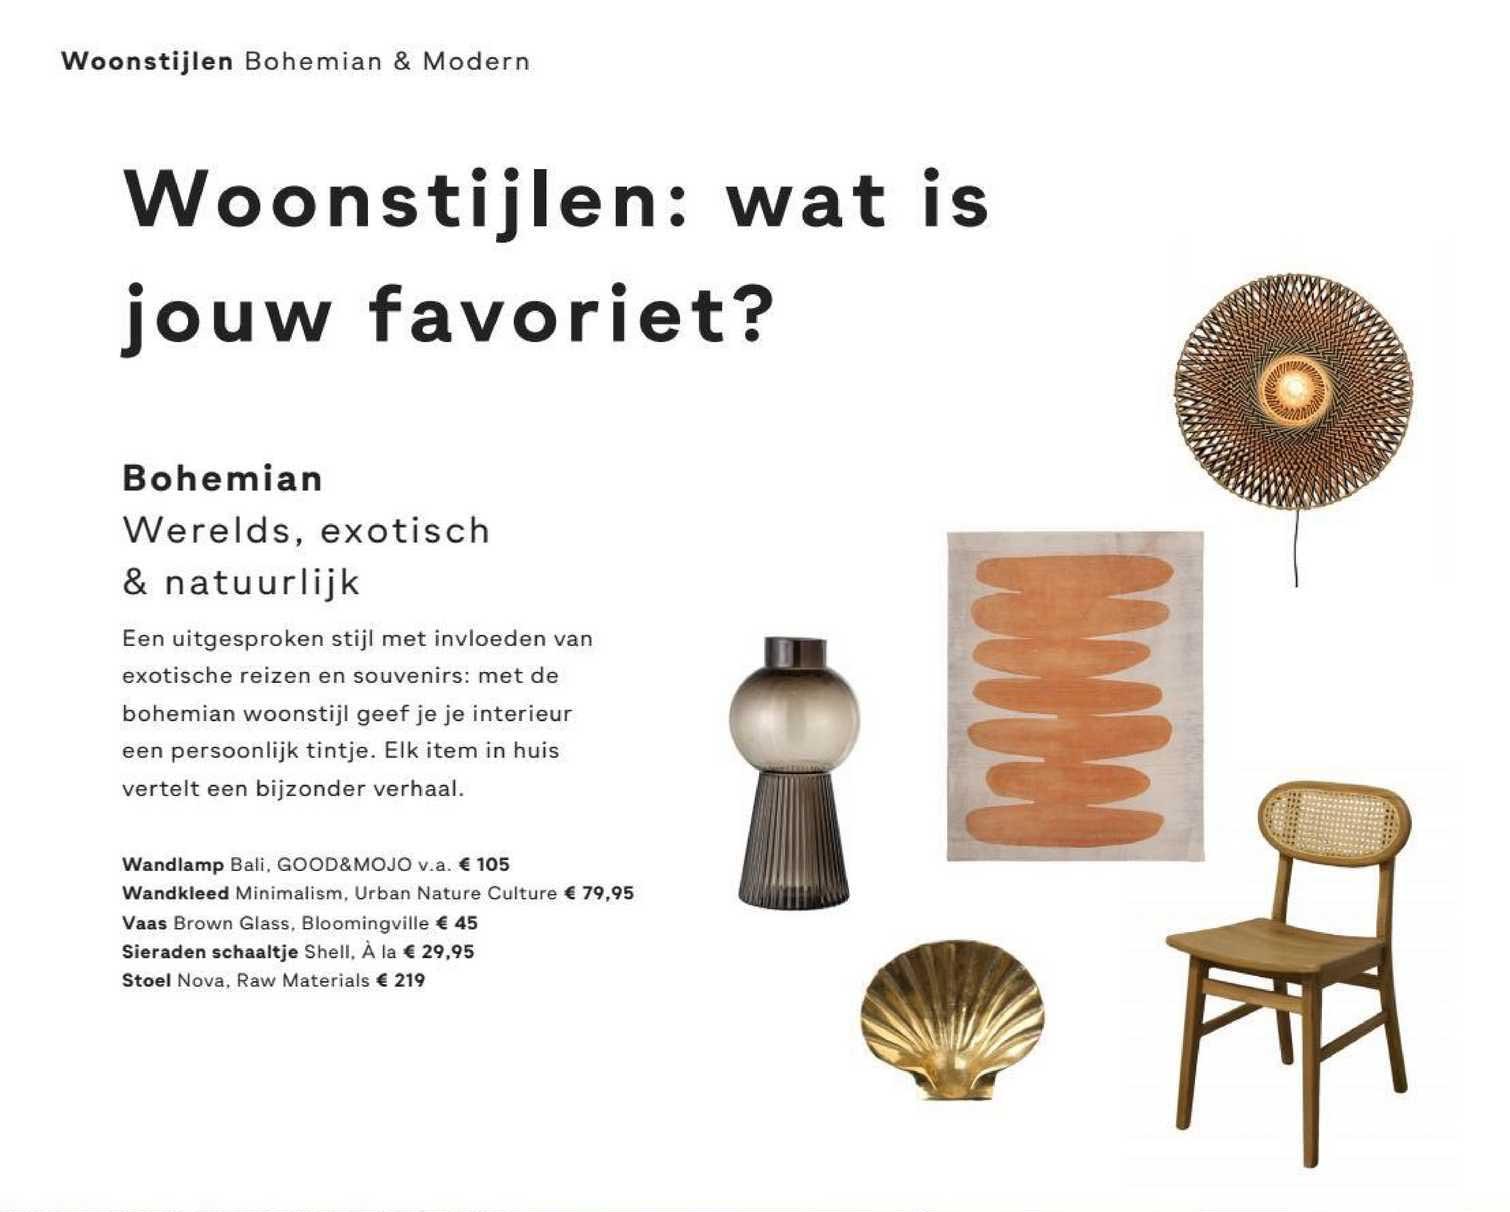 FonQ Wandlamp Bali, Wandkleed Minimalism, Vaas Brown Glass, Sieraden Schaaltje Shell Of Stoel Nova